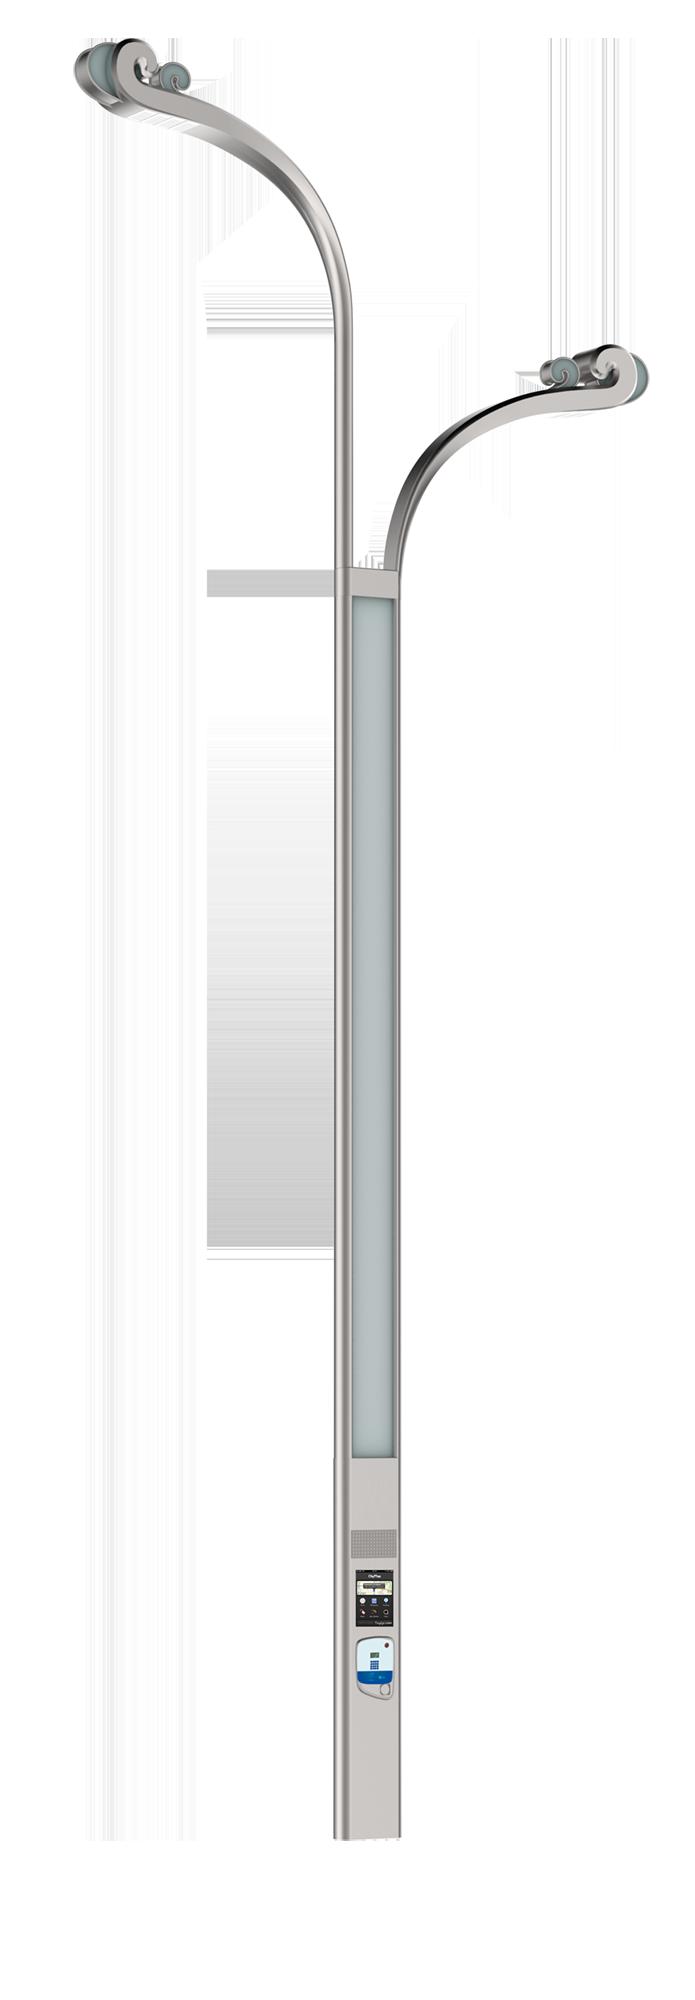 Lamp clipart intelligent. Street png top light